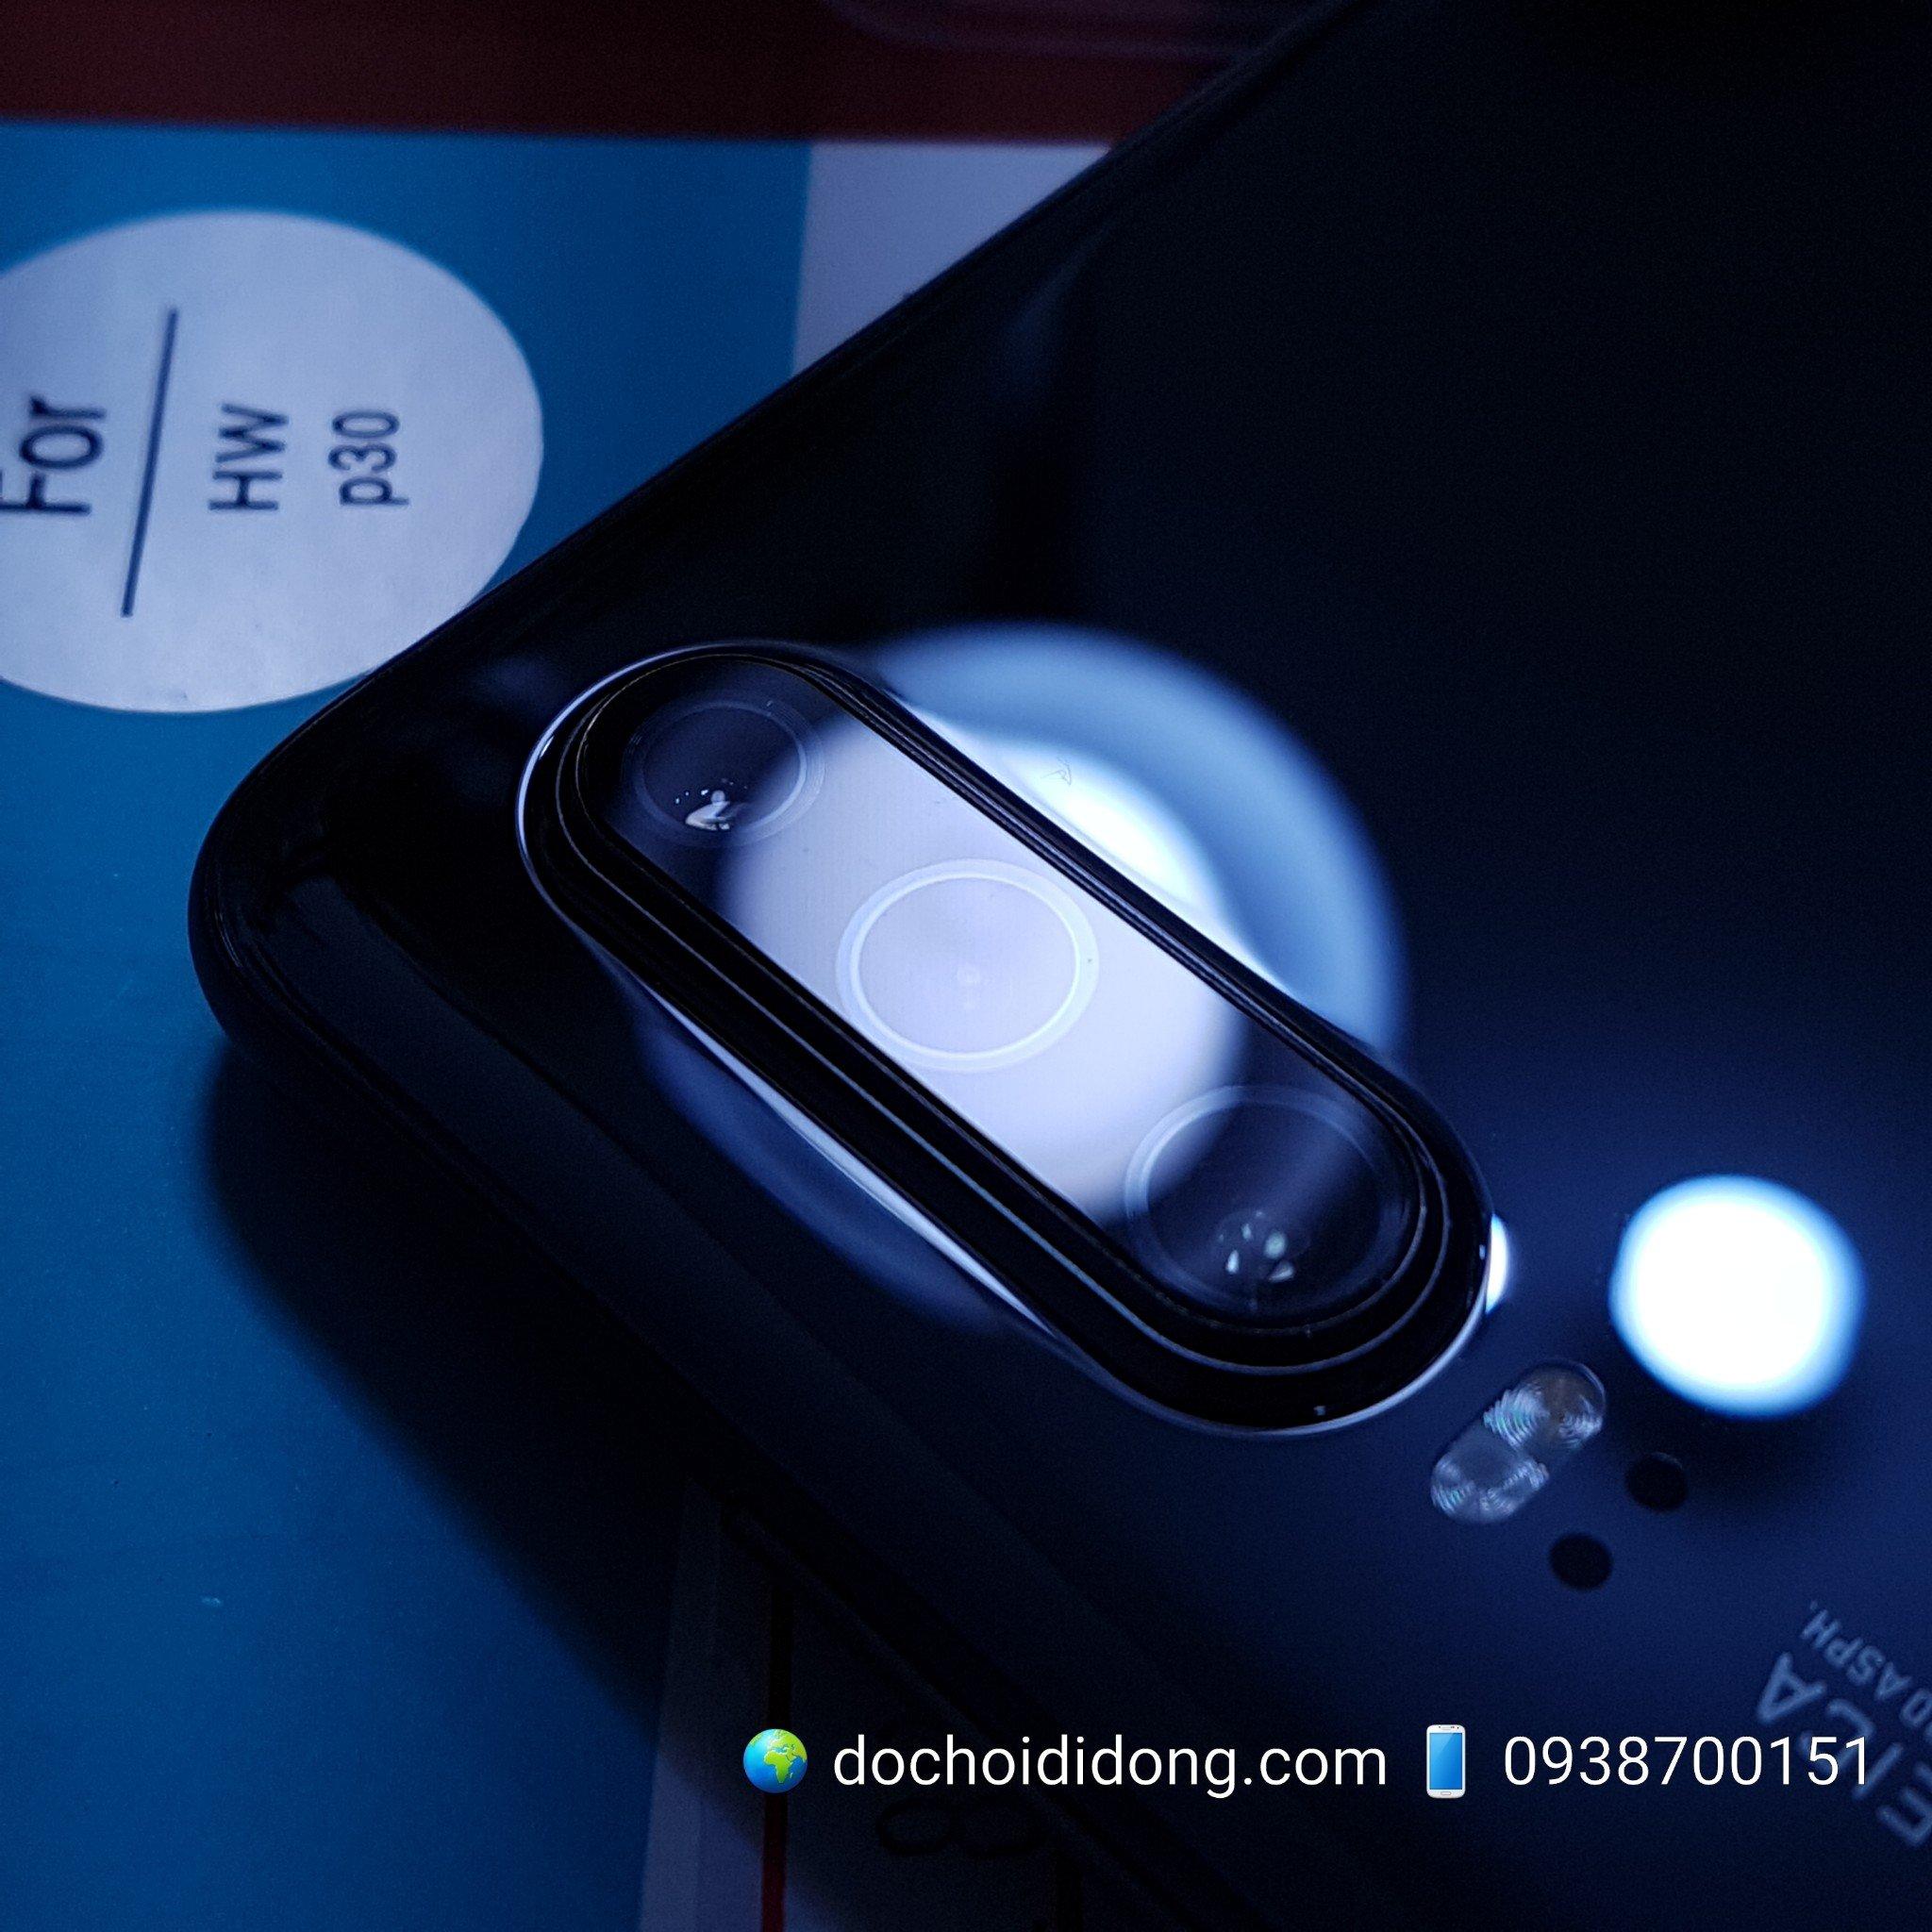 mieng-dan-cuong-luc-camera-huawei-p30-9h